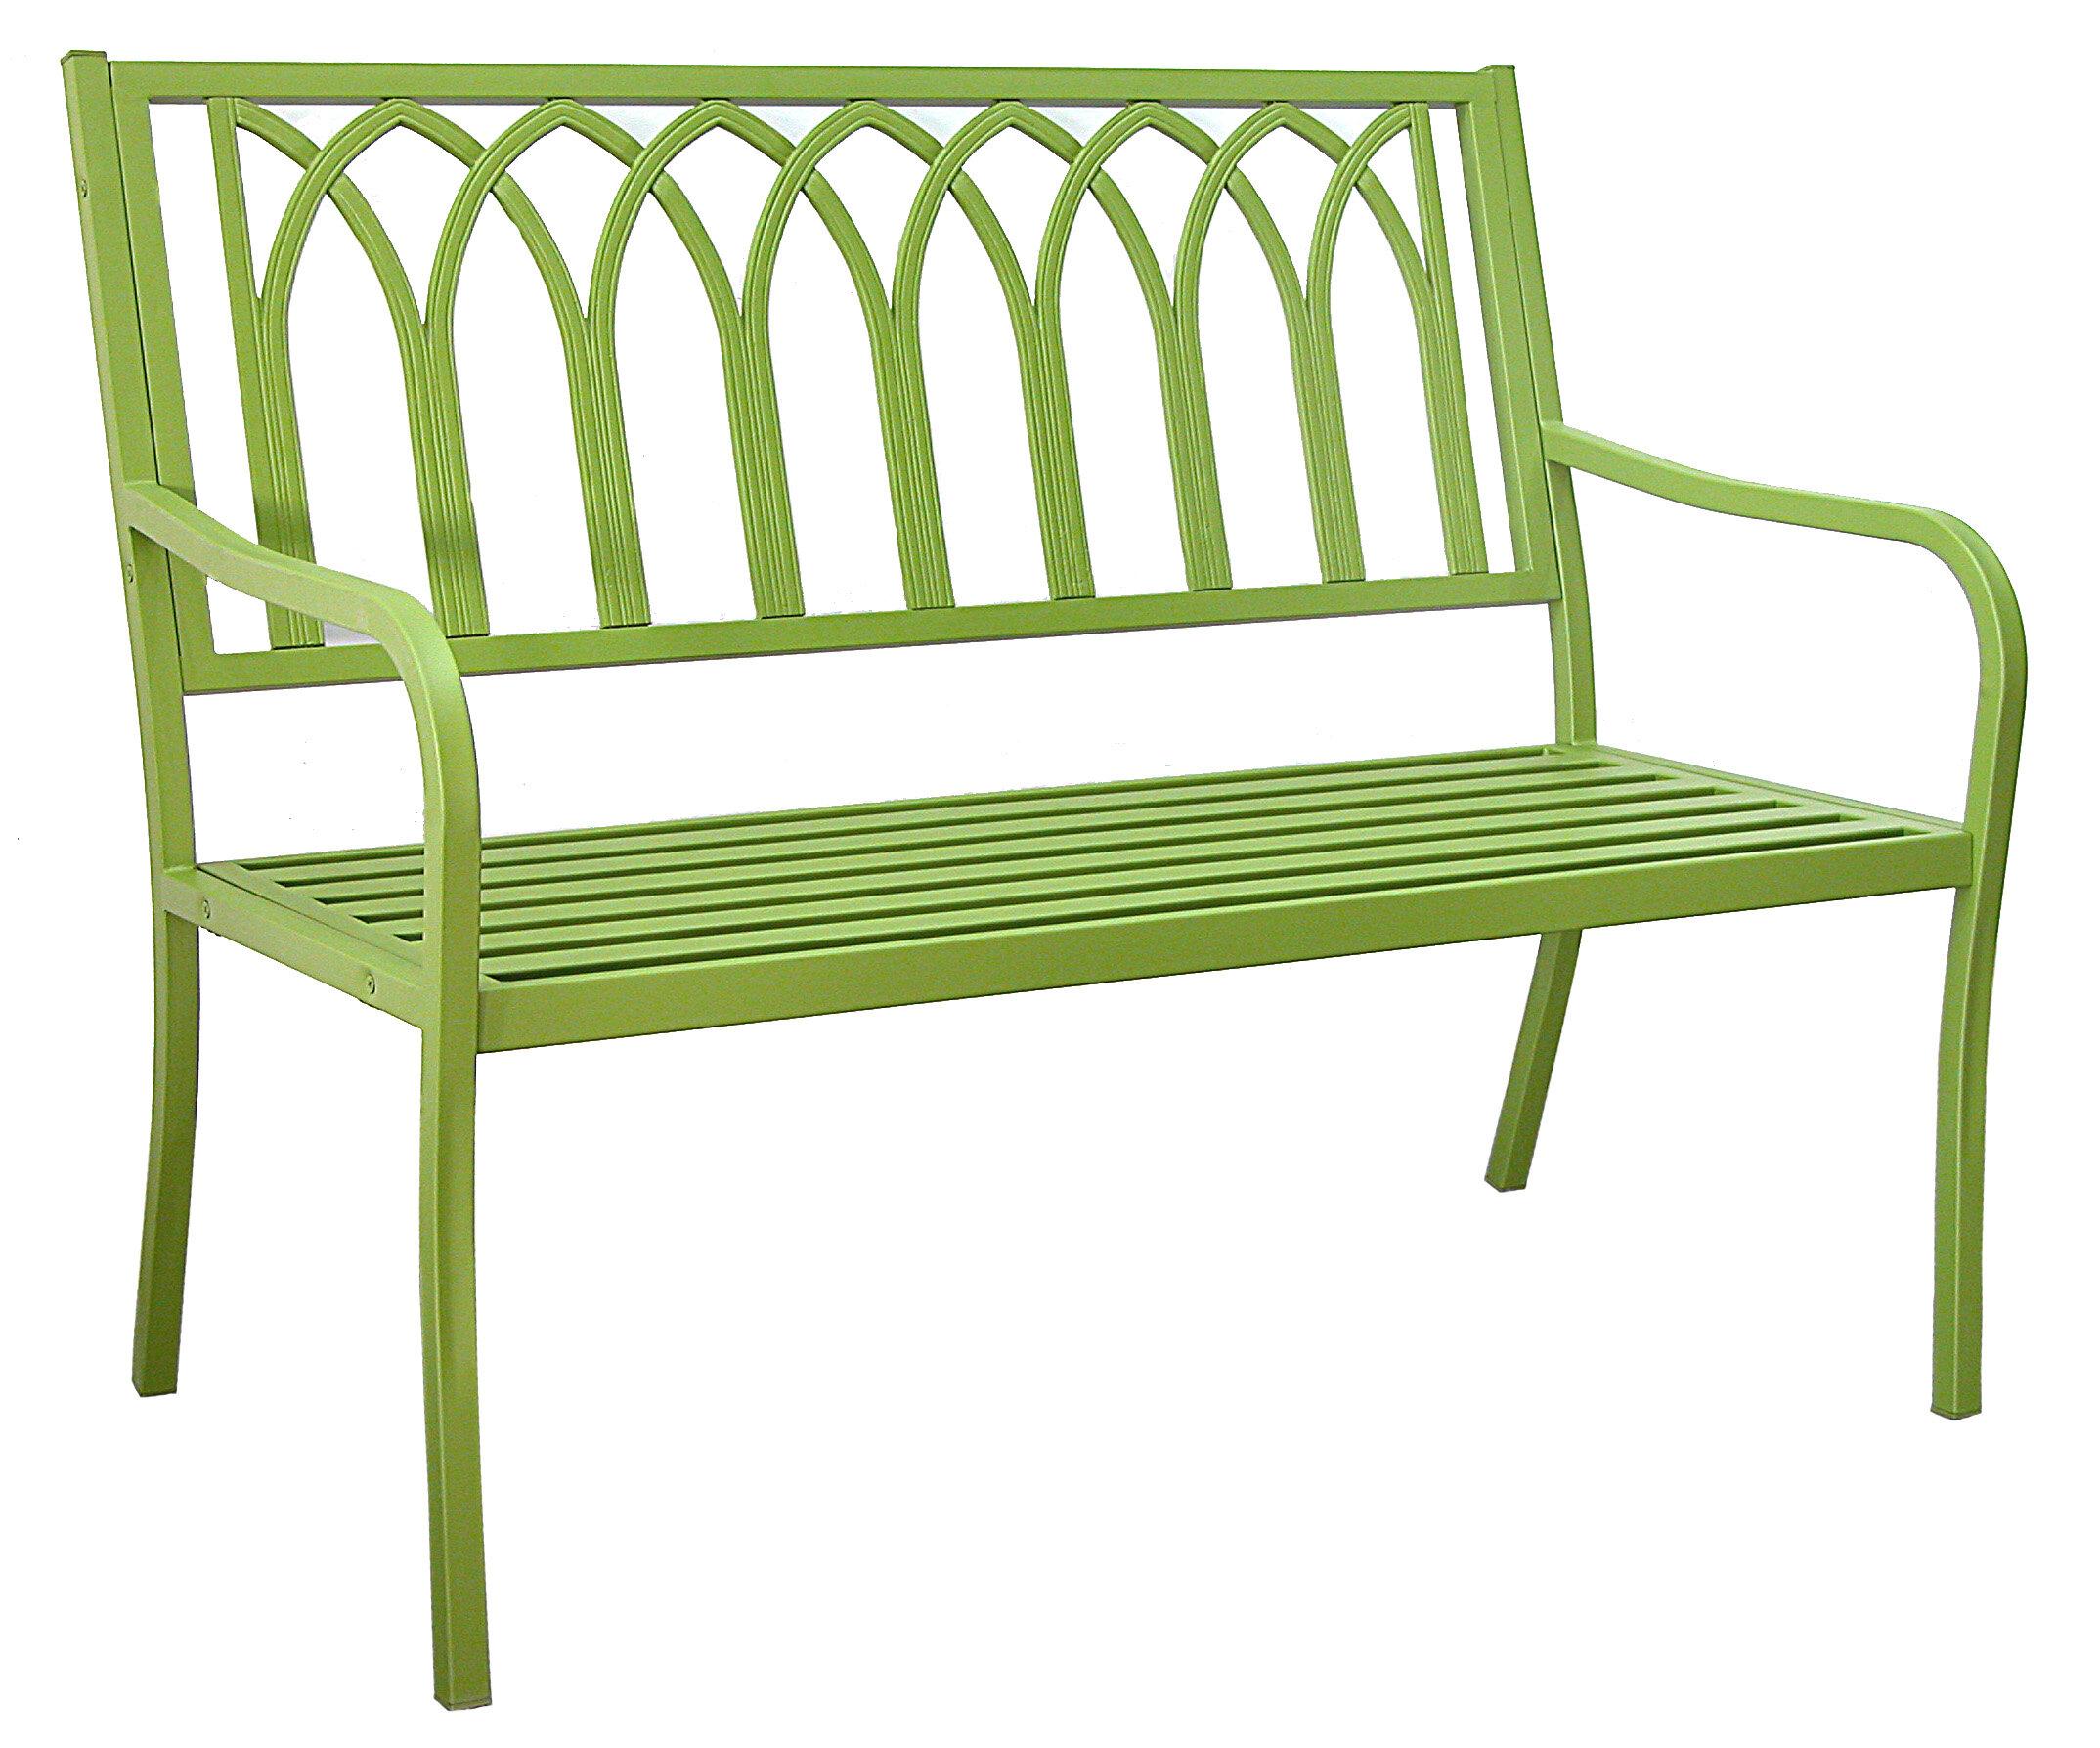 Excellent Blankenship Steel Garden Bench Ibusinesslaw Wood Chair Design Ideas Ibusinesslaworg